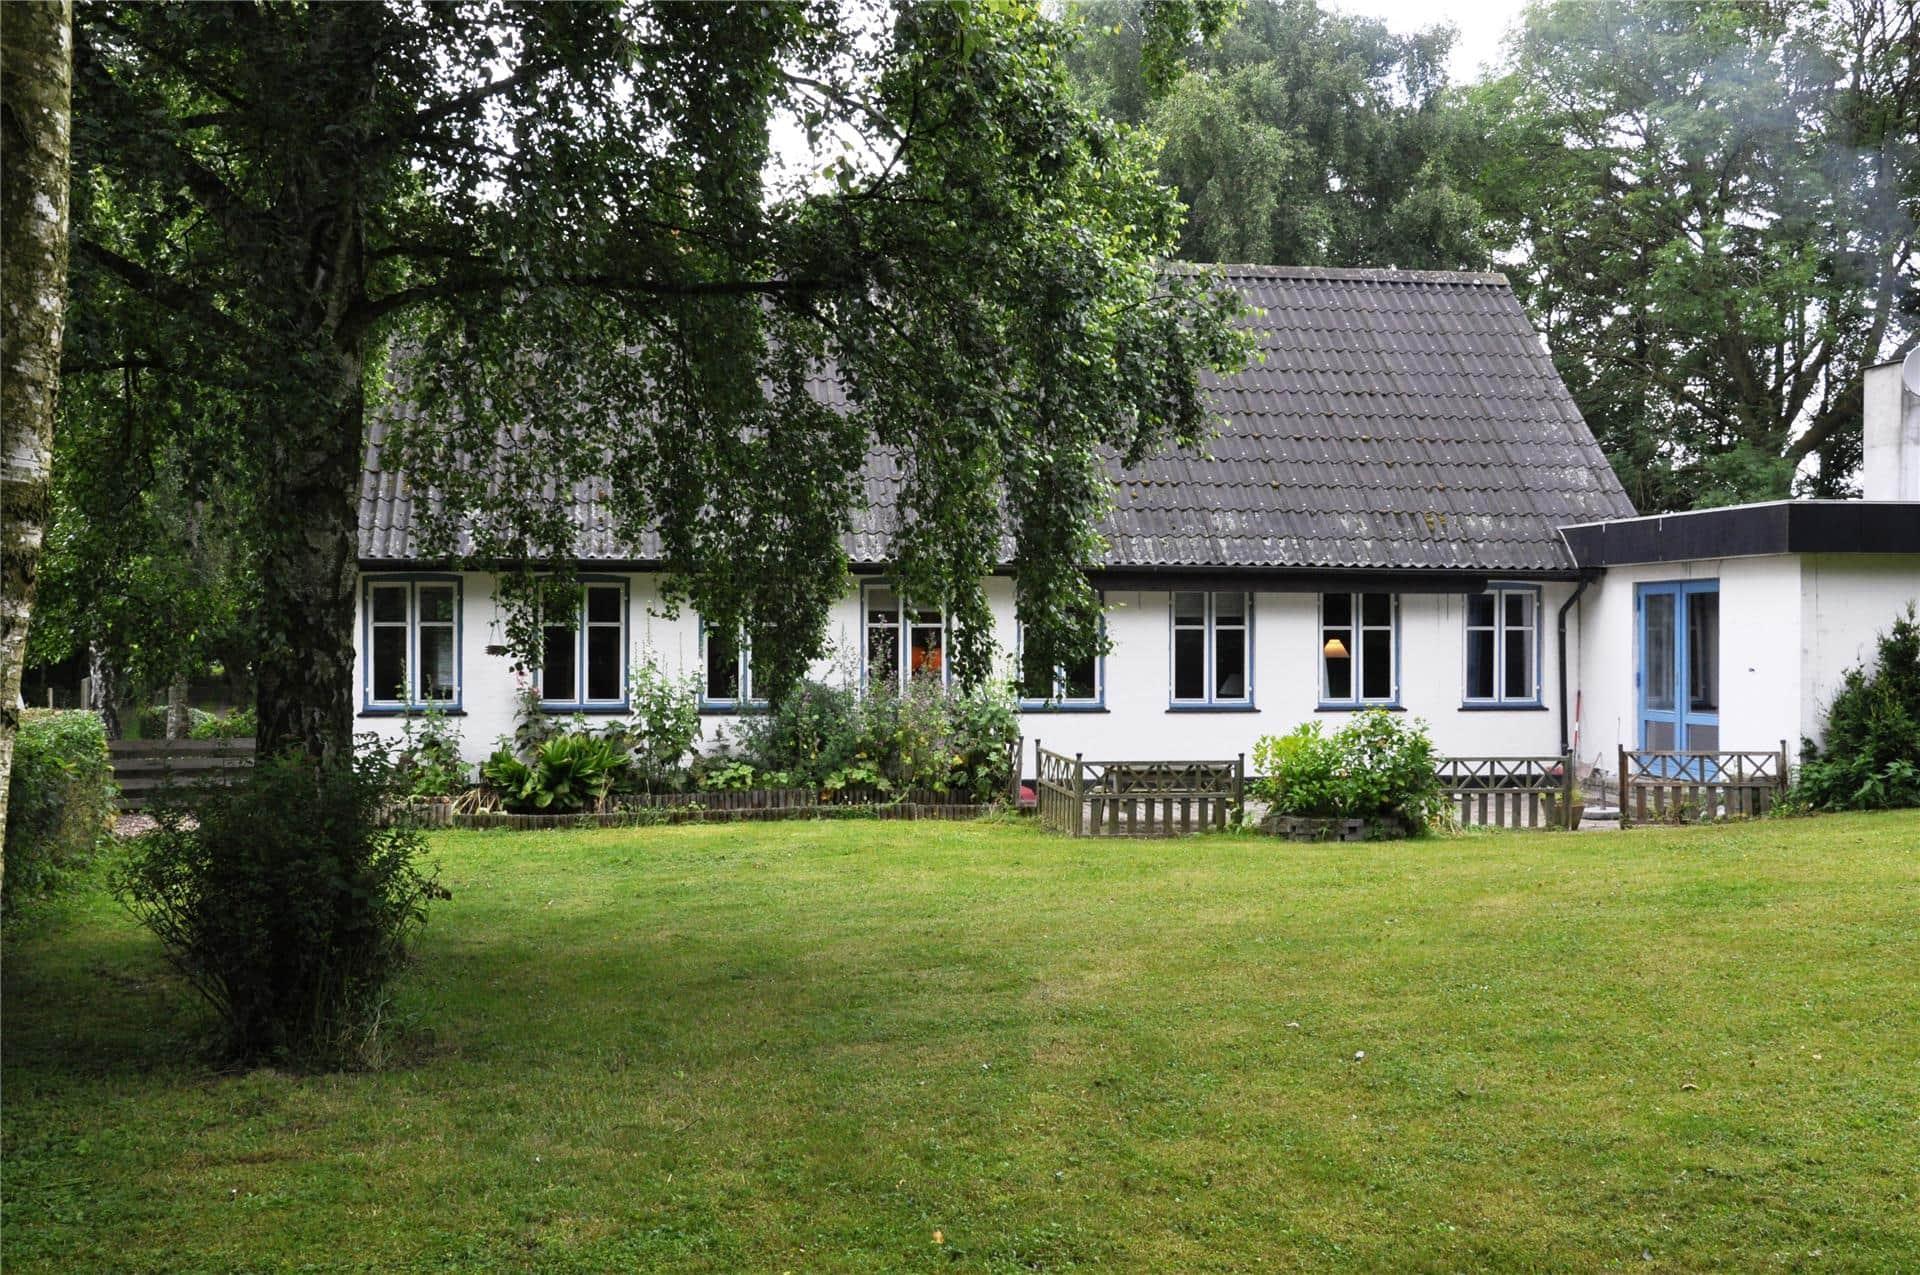 Billede 1-15 Sommerhus 4310, Nordfeldtvej 42, DK - 4780 Stege